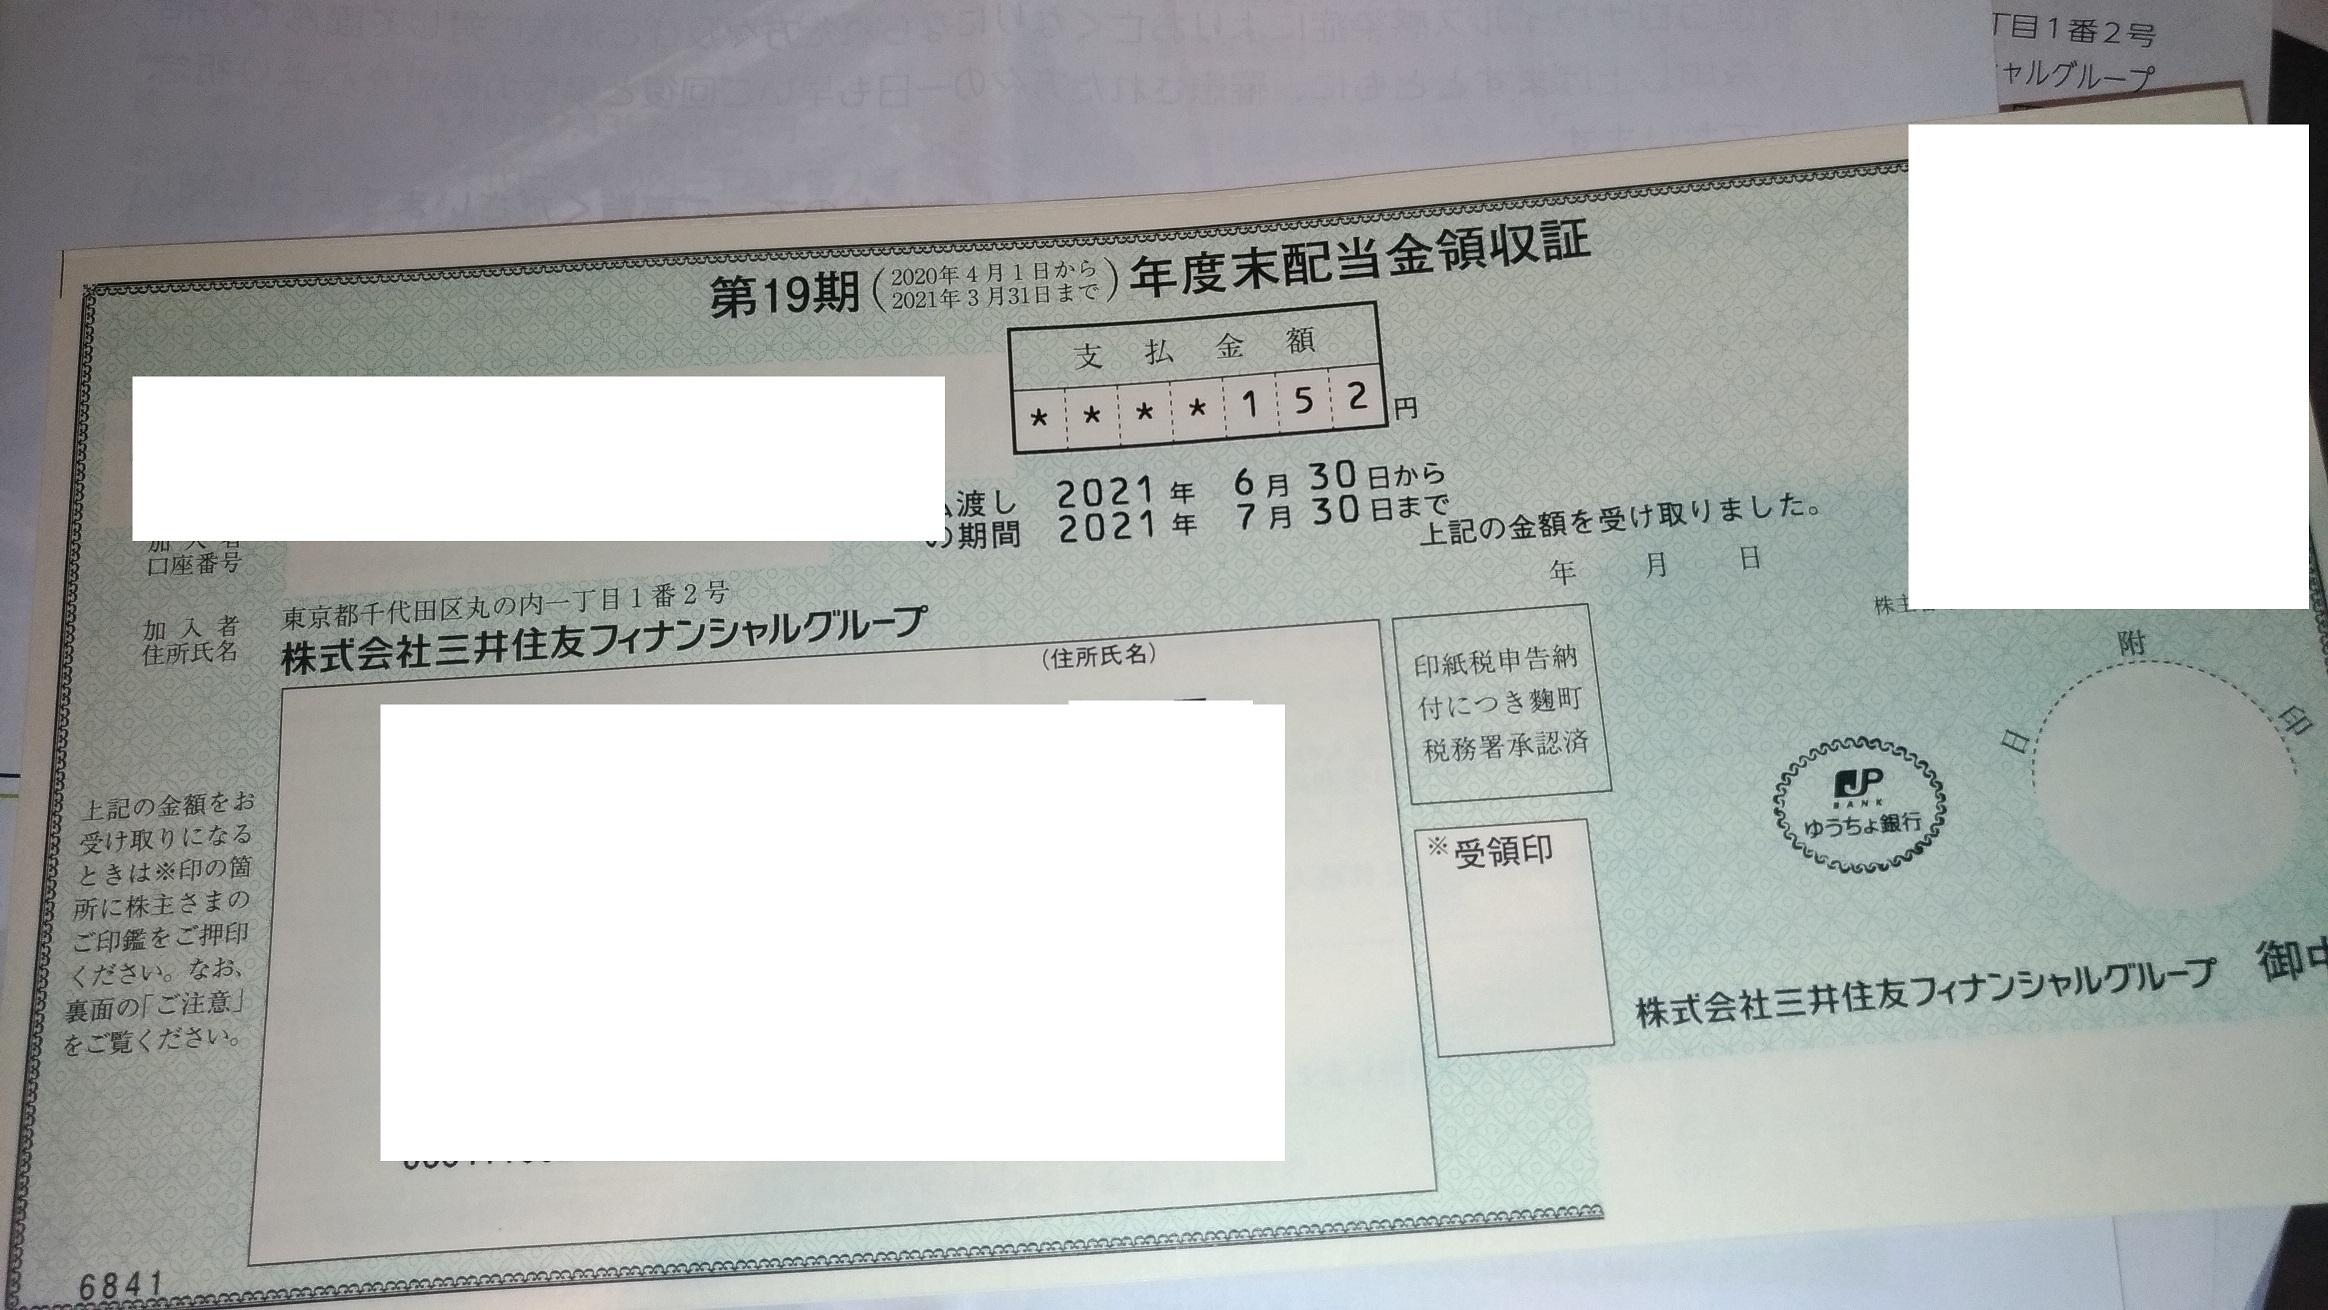 kabu_mitsui_1.jpg